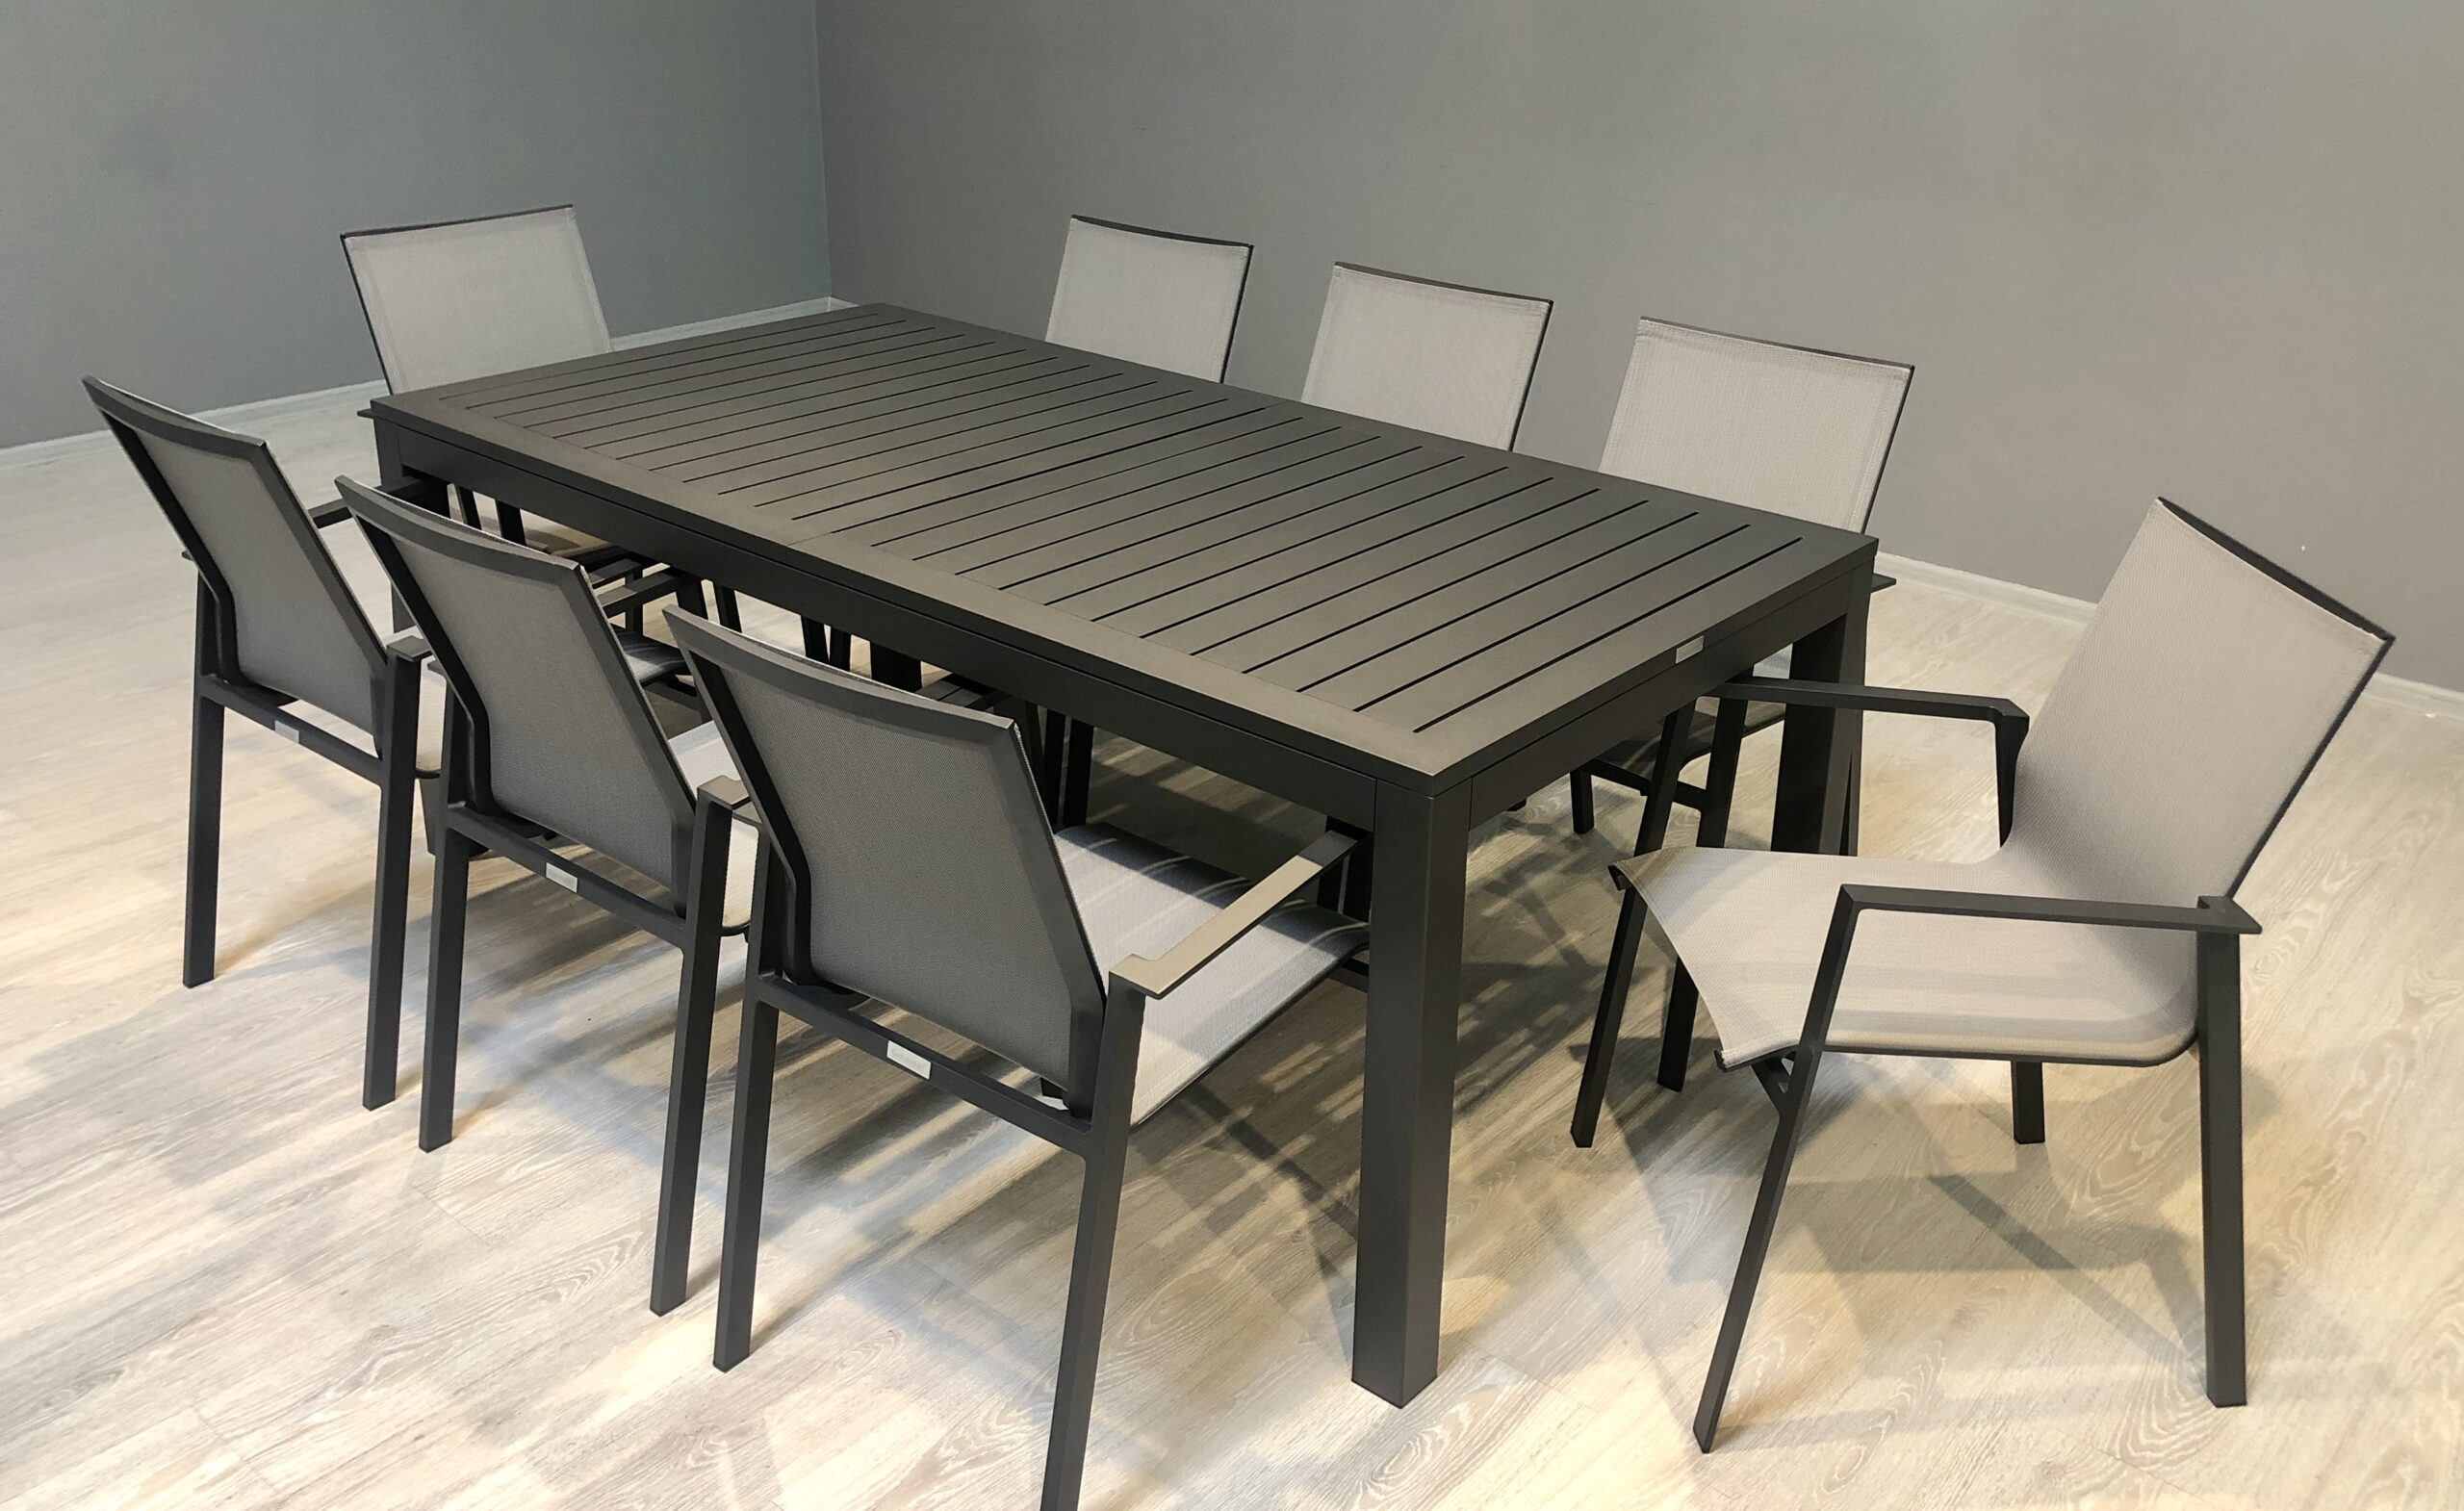 Раскладной Стол Linear 6-8-12 Персон